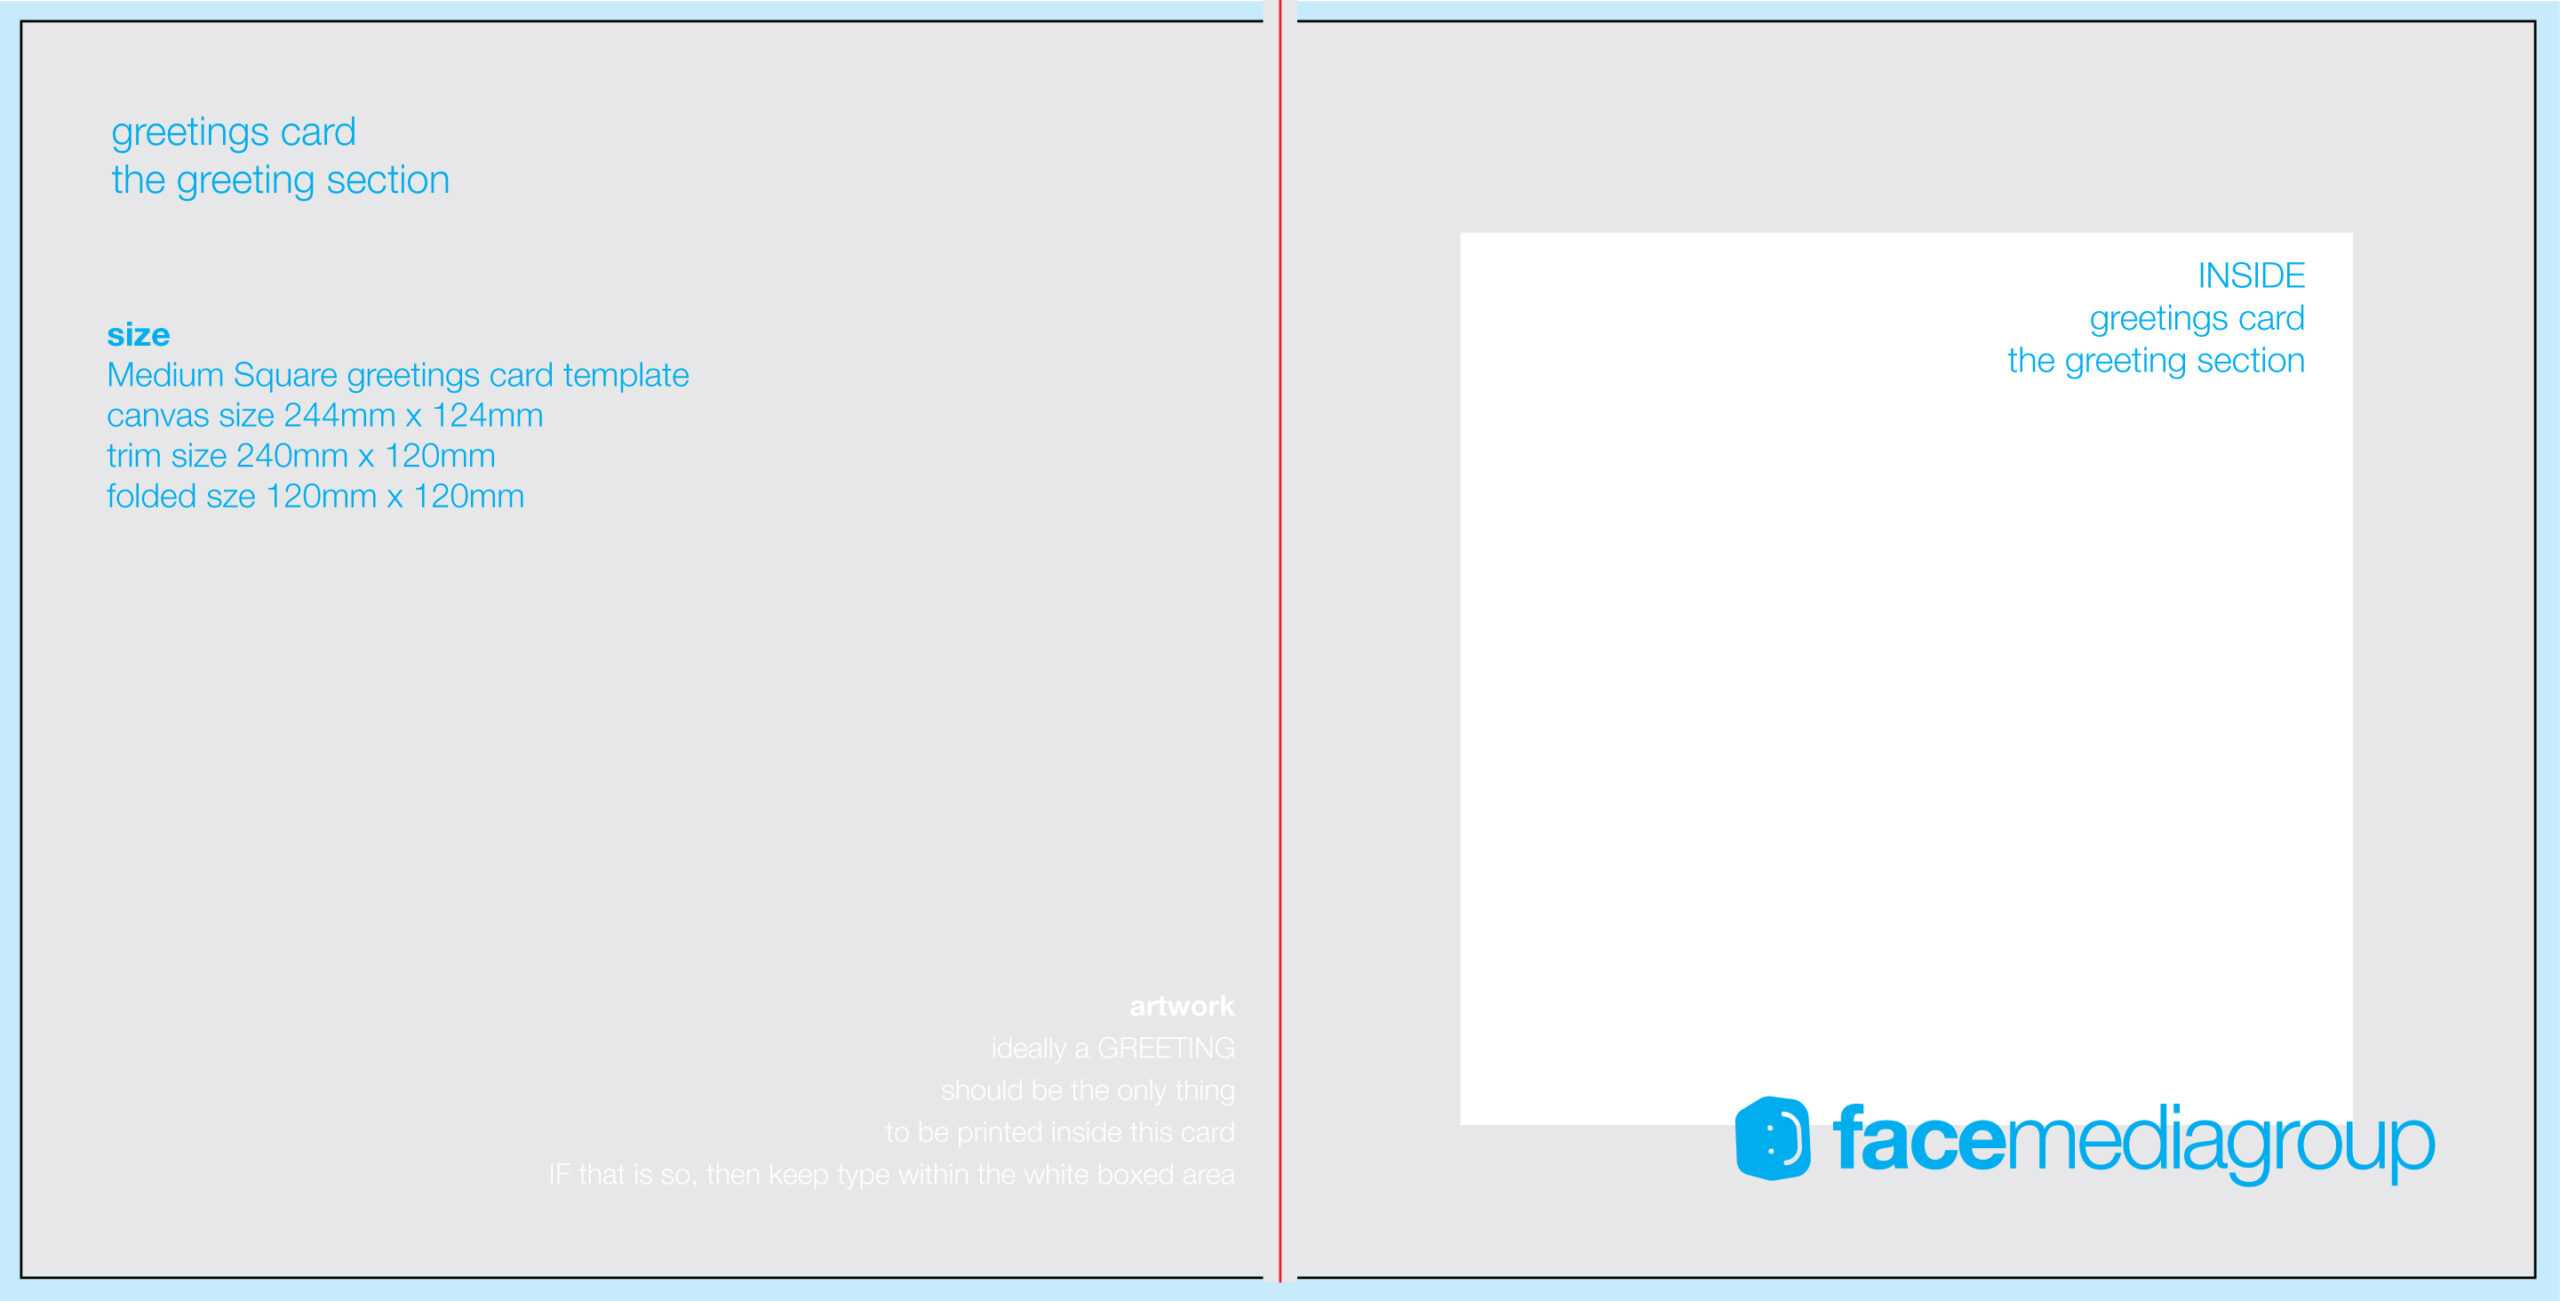 Microsoft Word Greeting Card Template Blank - Tunu.redmini.co For Free Printable Blank Greeting Card Templates